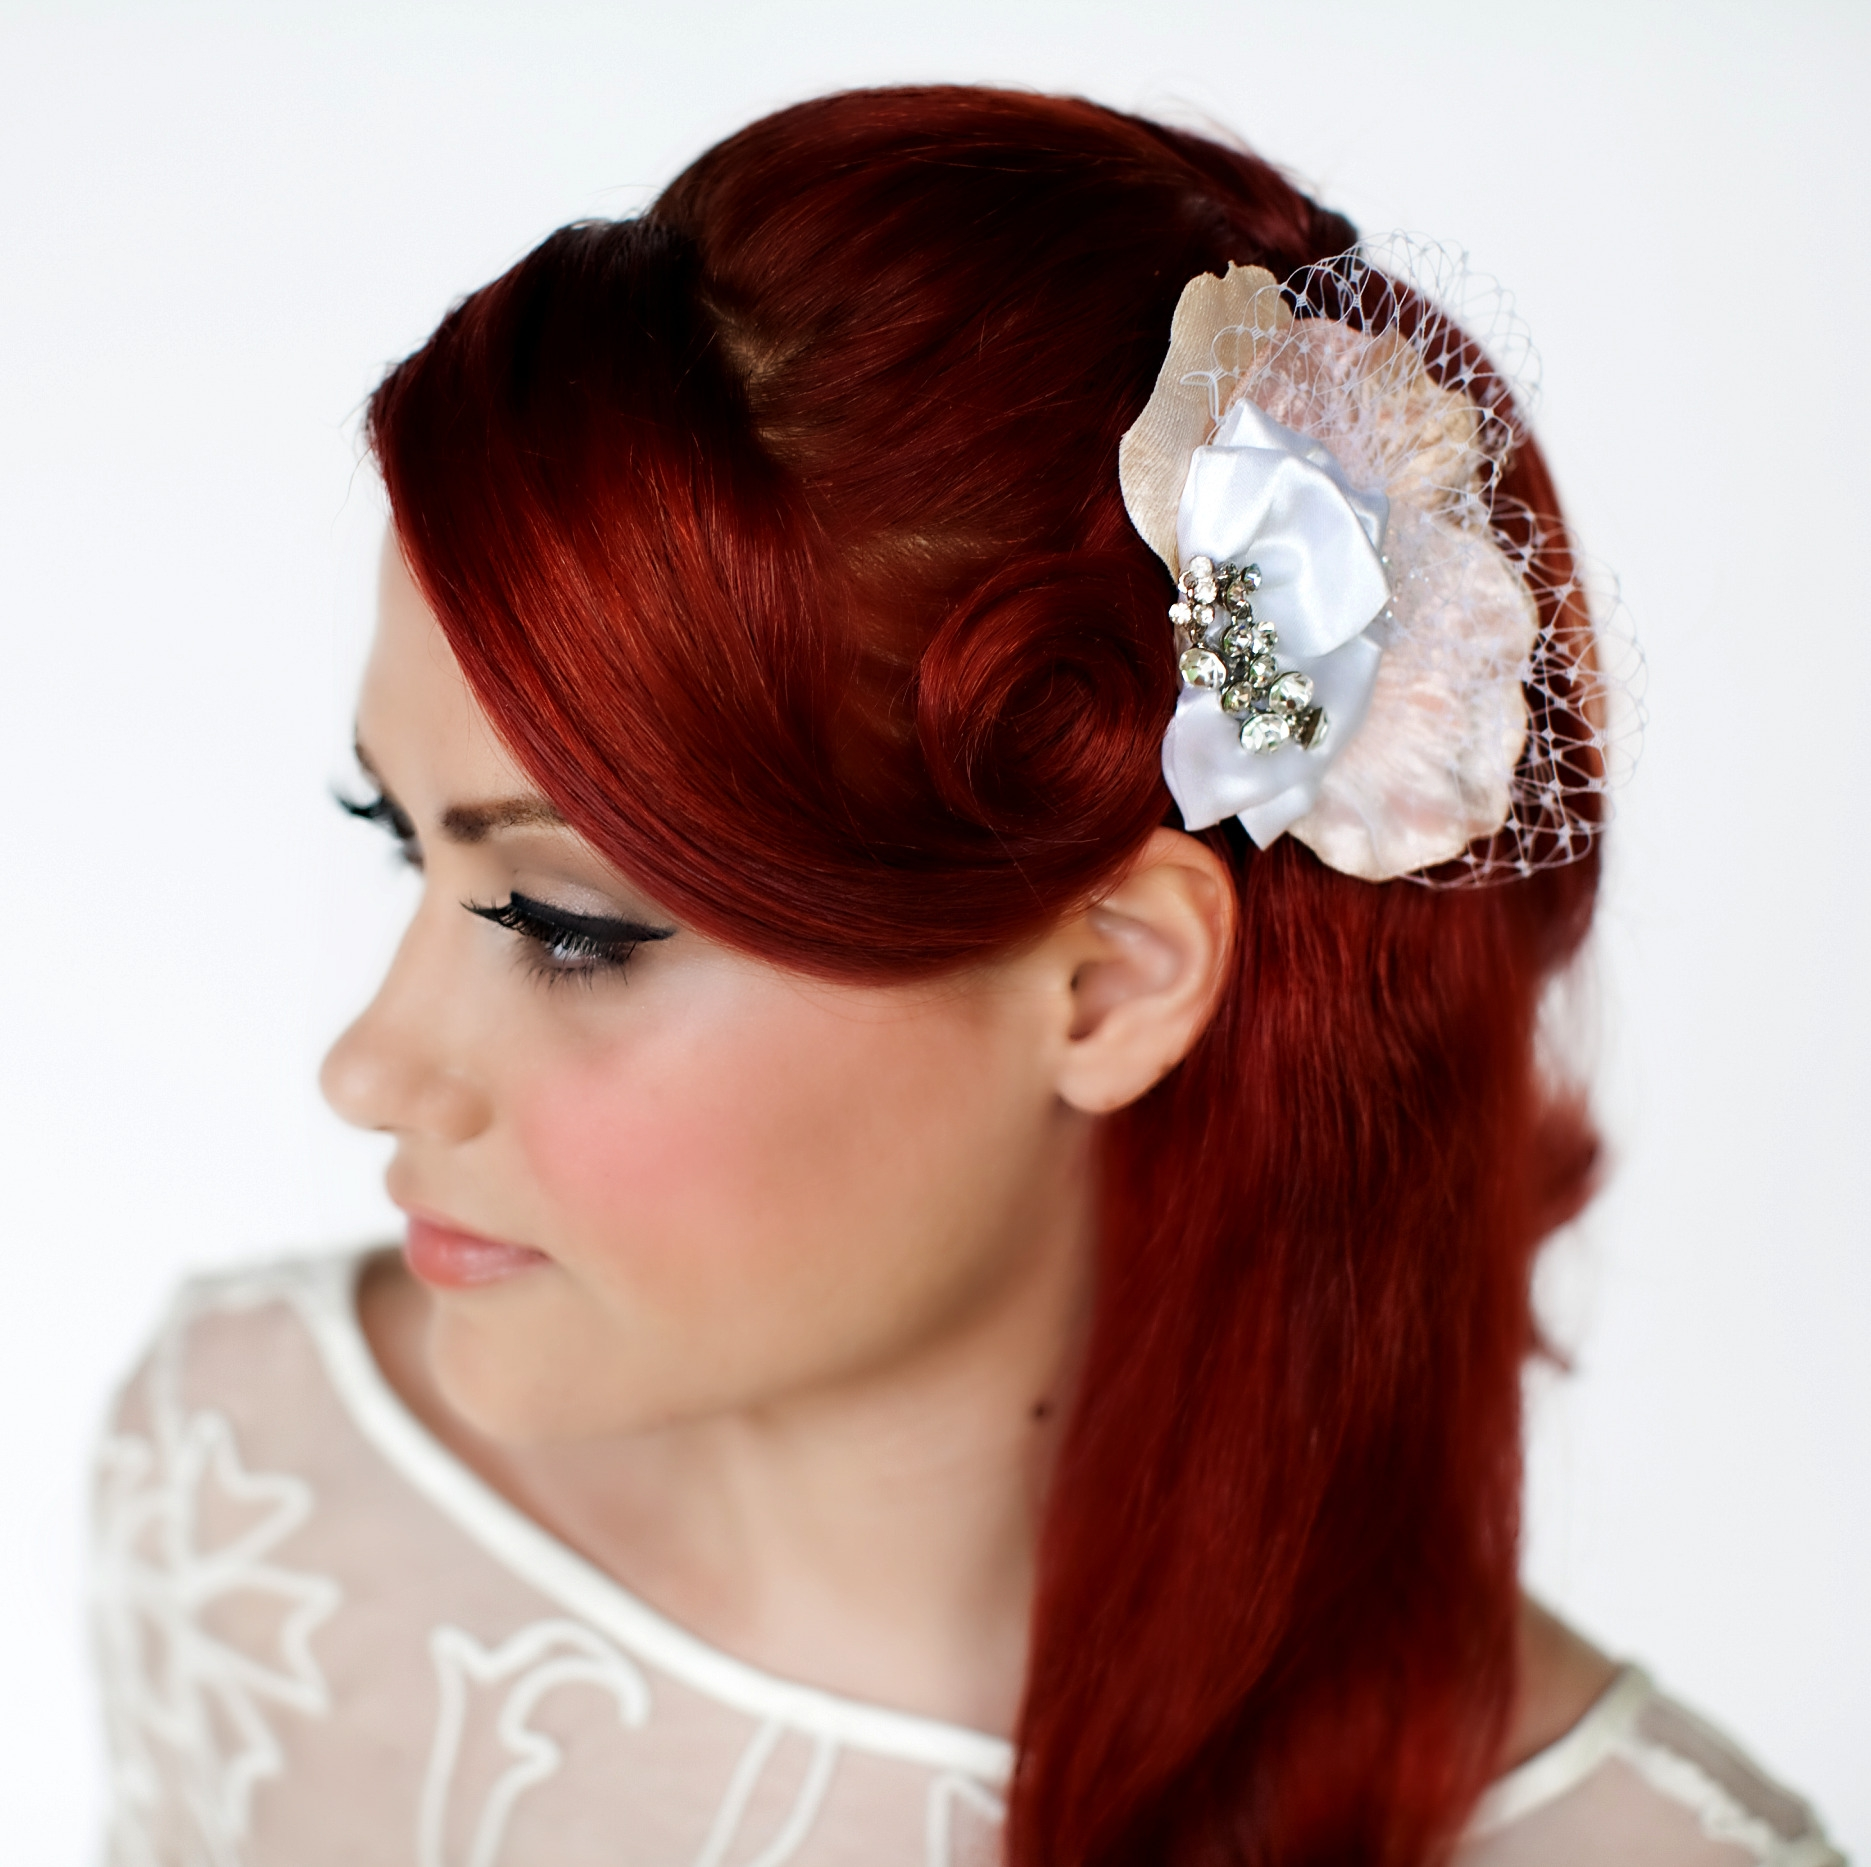 Wedding Vintage Style Hair Accessories: Stunning Bridal Hair Accessory- Sculptured Fabric Flower